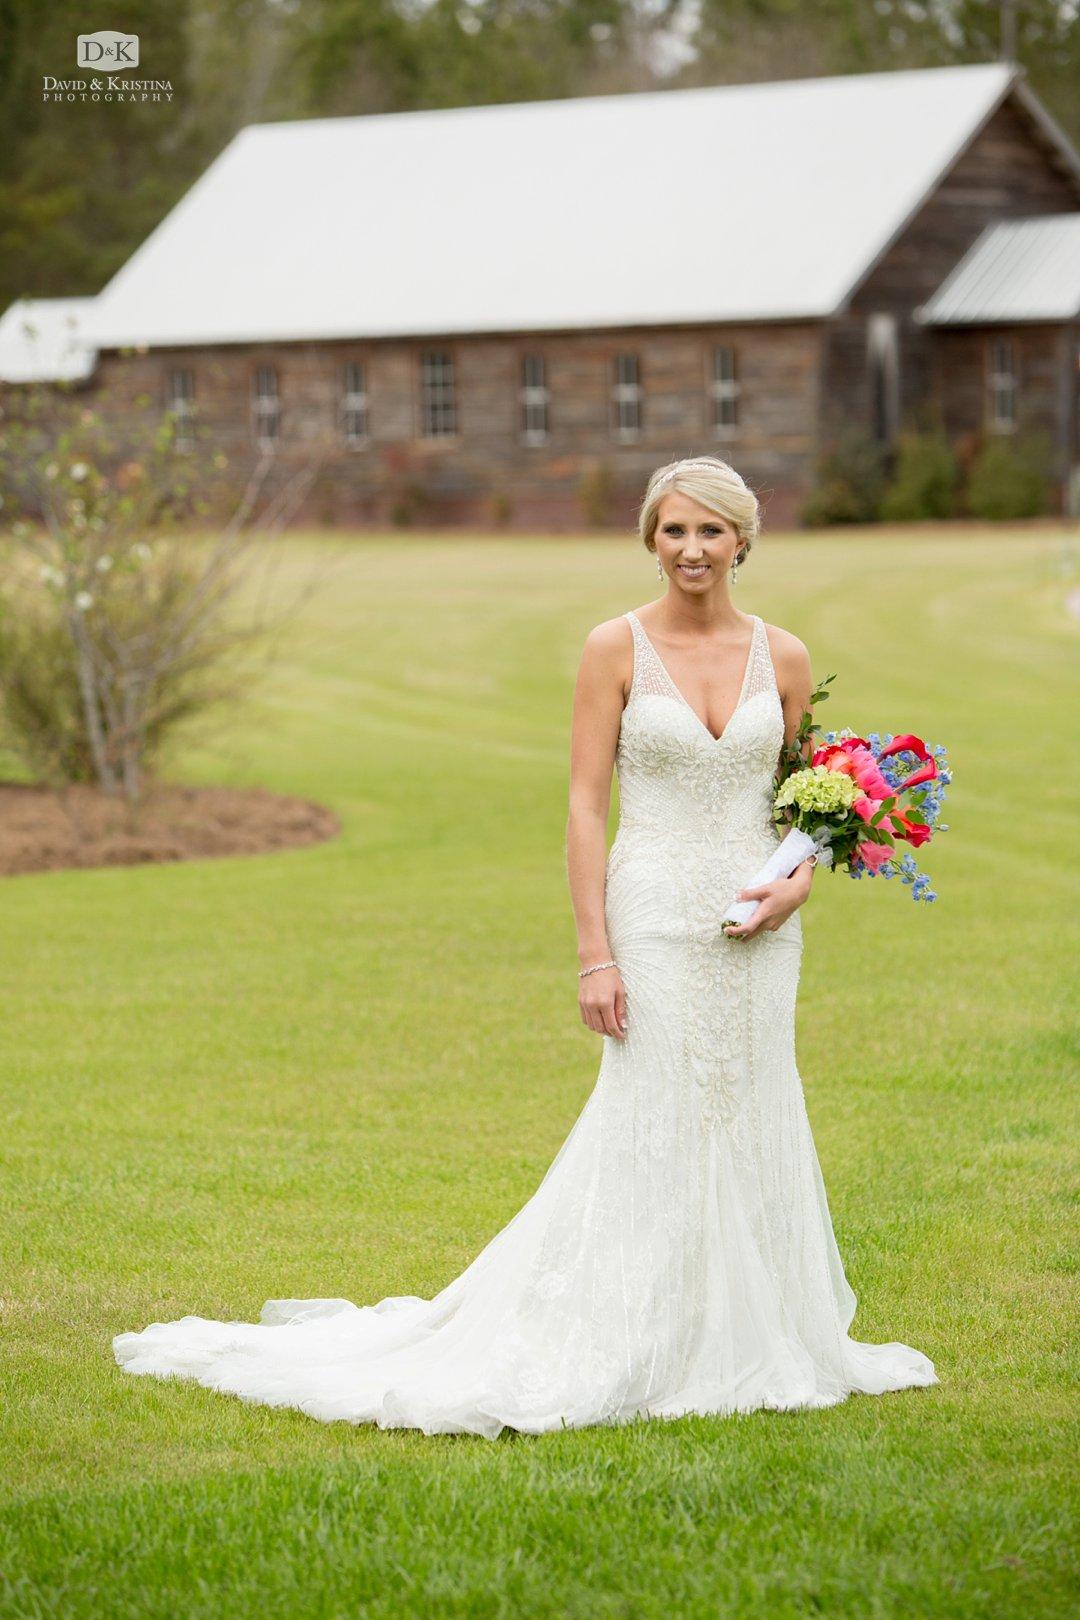 Amber in wedding dress